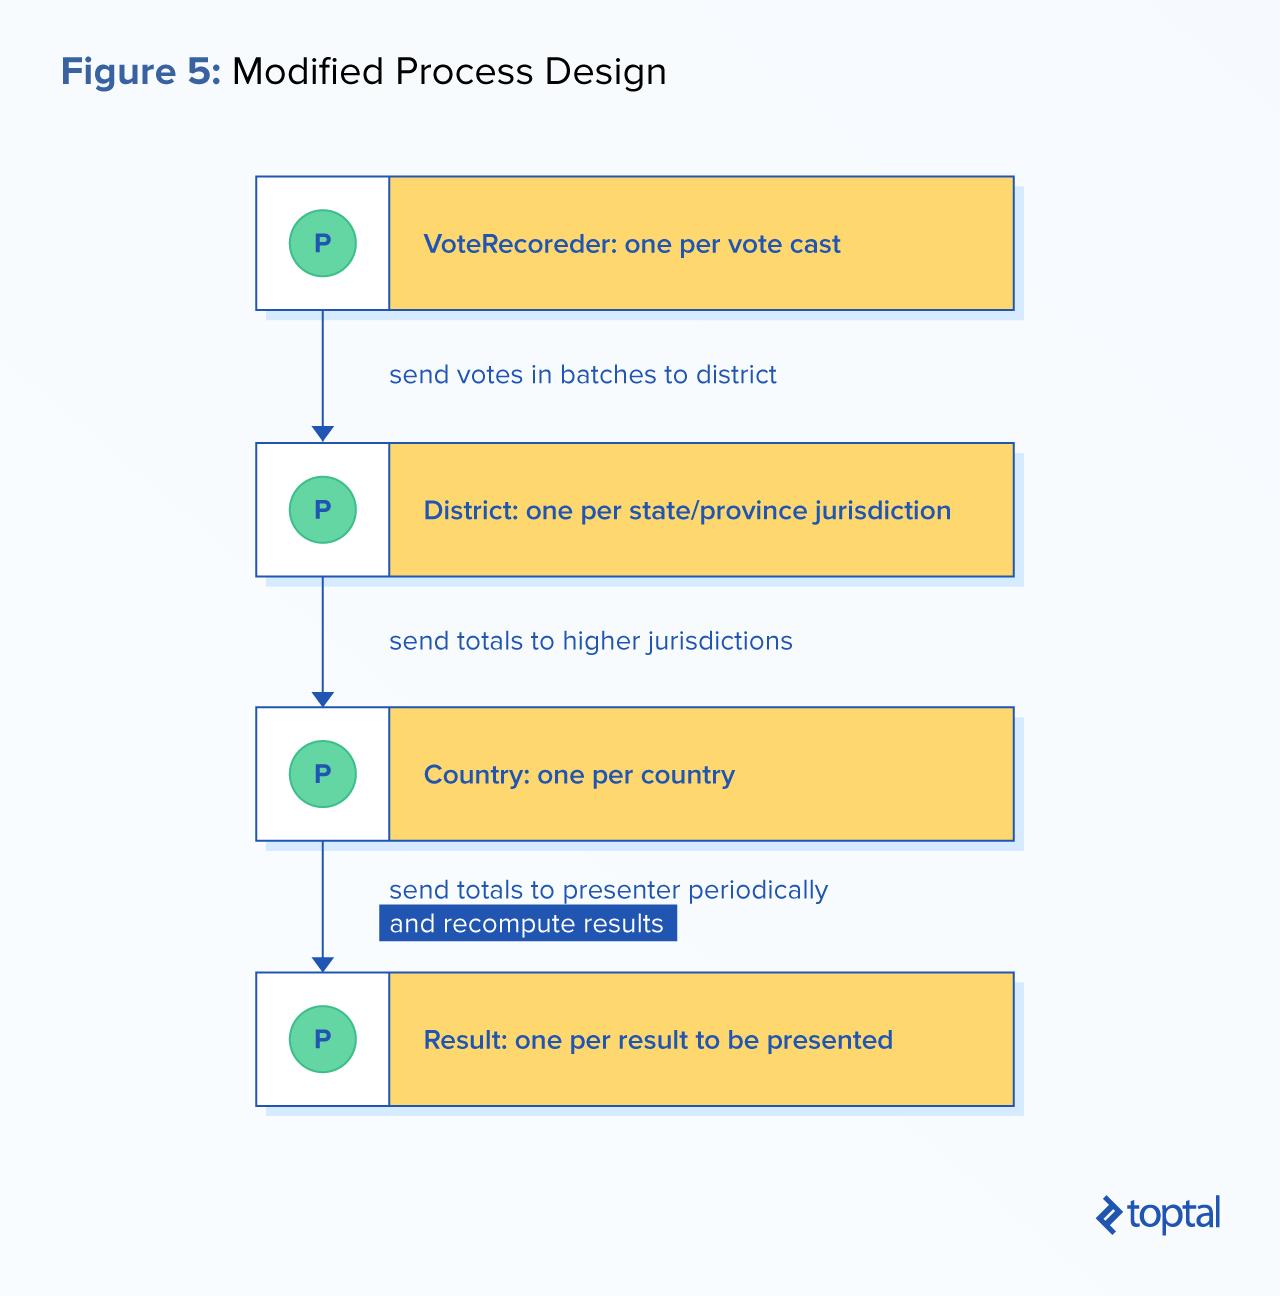 Process-oriented development example: Modified process design